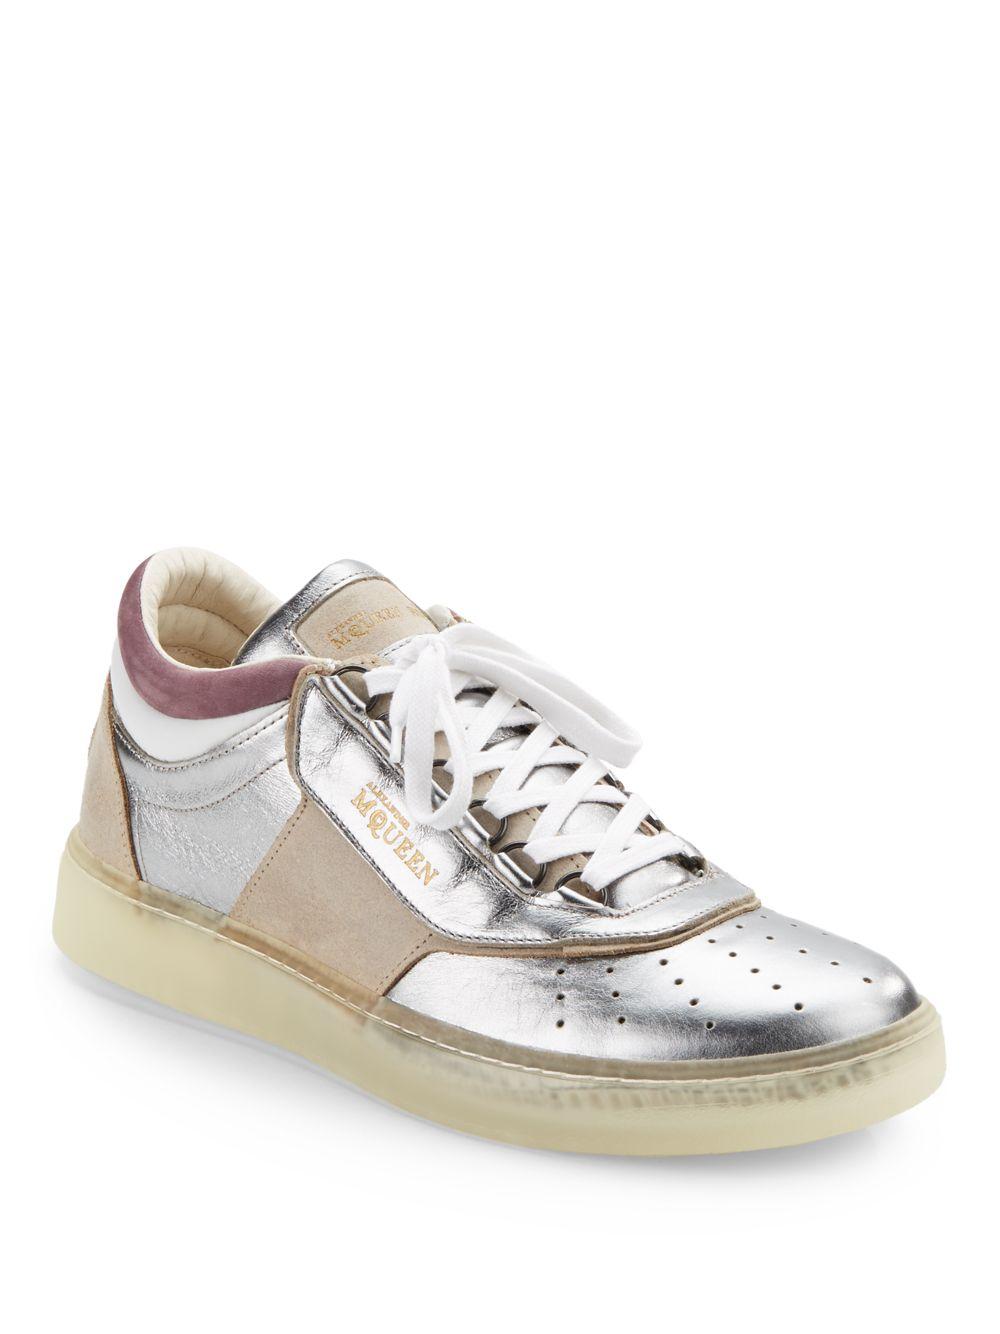 Lyst - Alexander McQueen X Puma Joust Lo Iii Metallic Leather ... 9c6738ab3